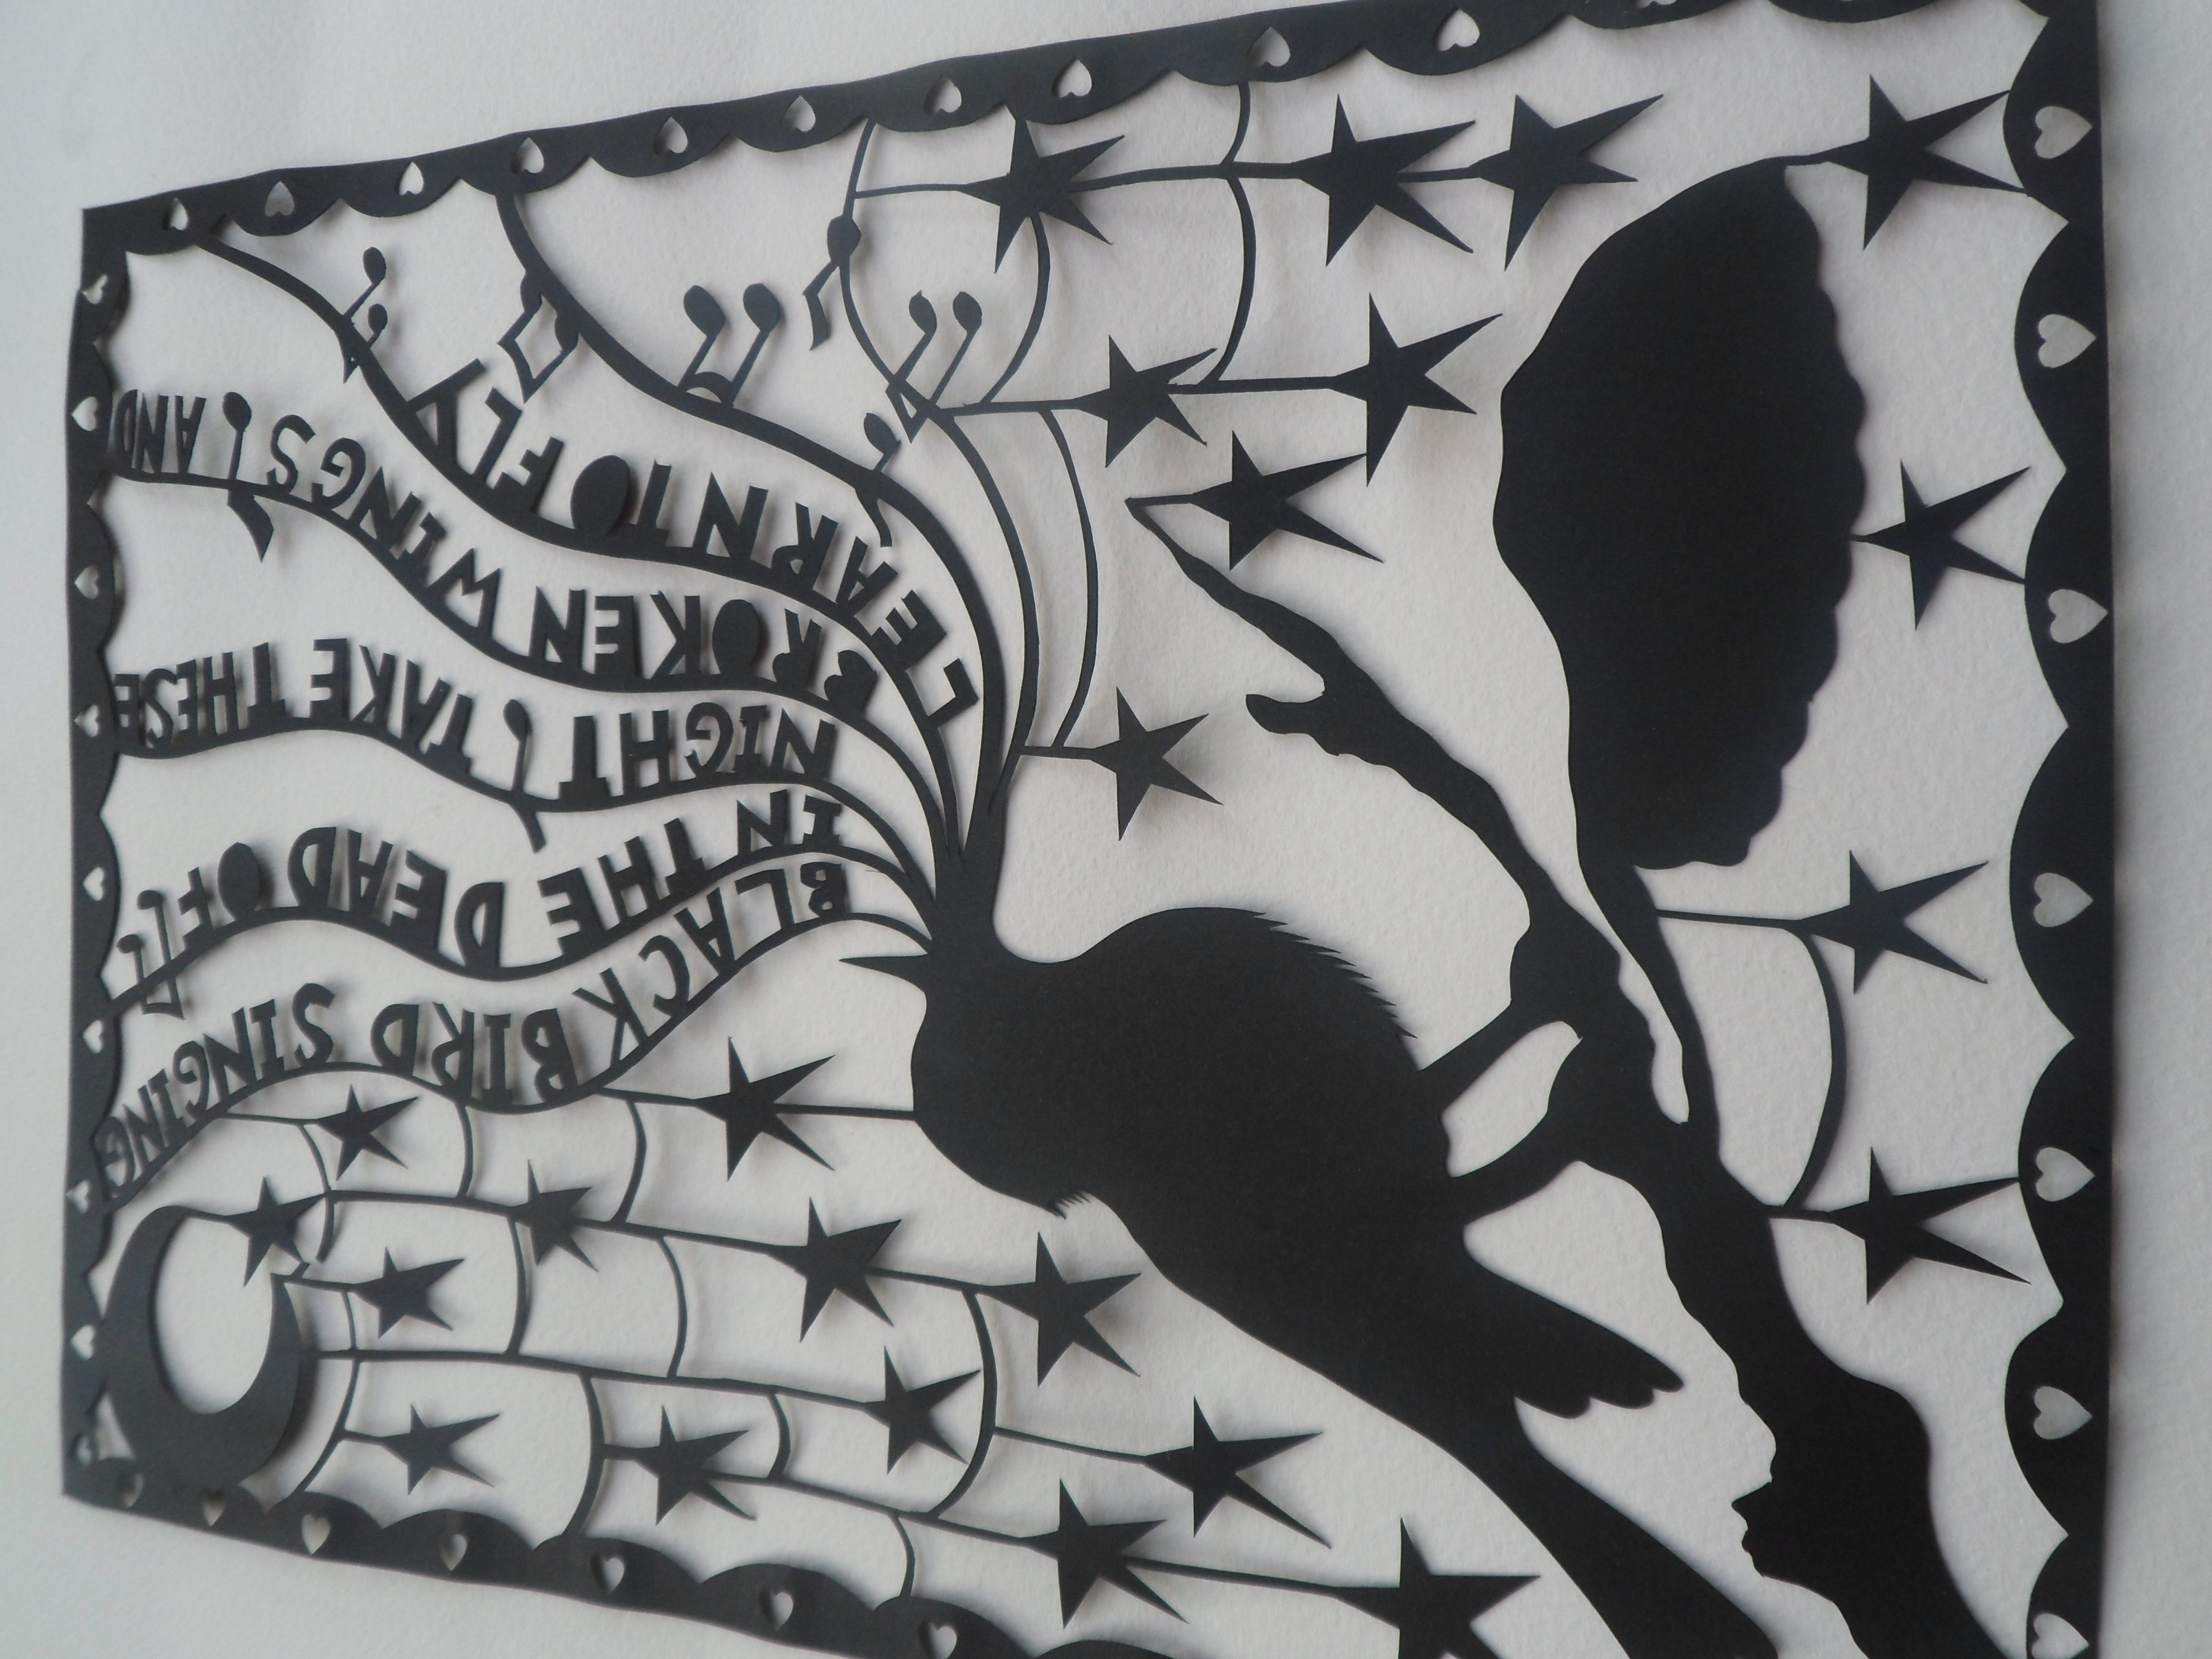 Original Hand Drawn And Cut, Papercut Art By Marmalade